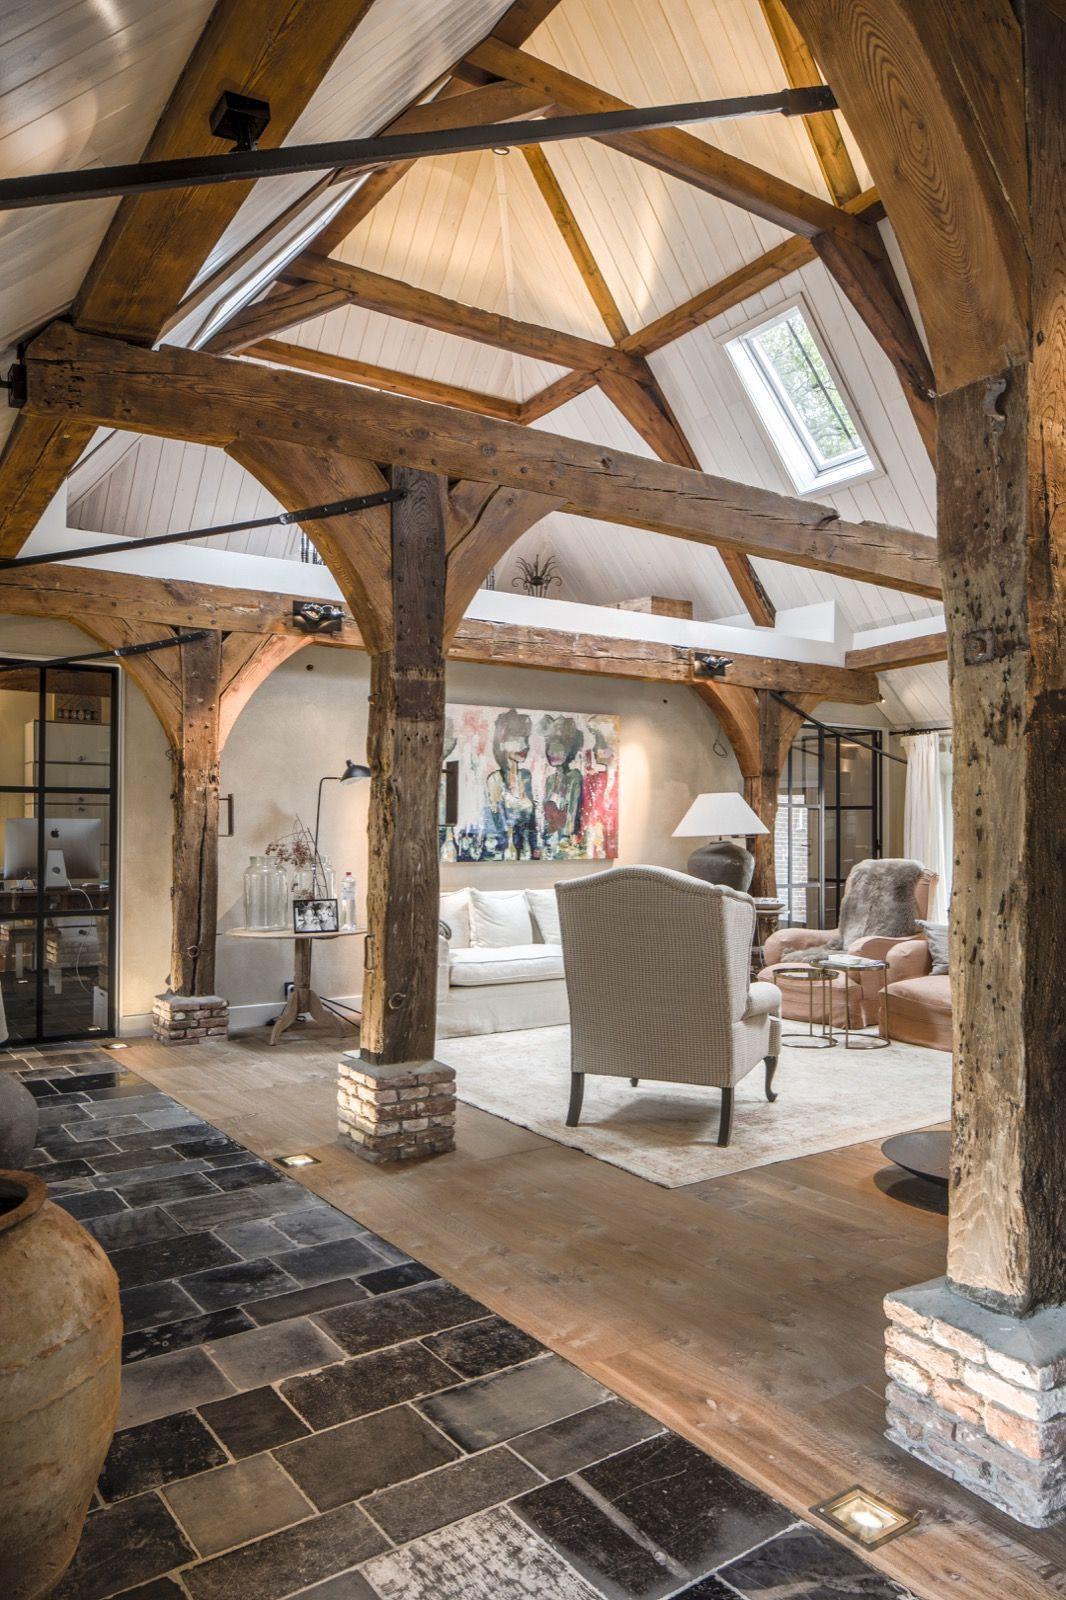 wooninspiratie-woonkamer-manman | My house | Pinterest | Interiors ...